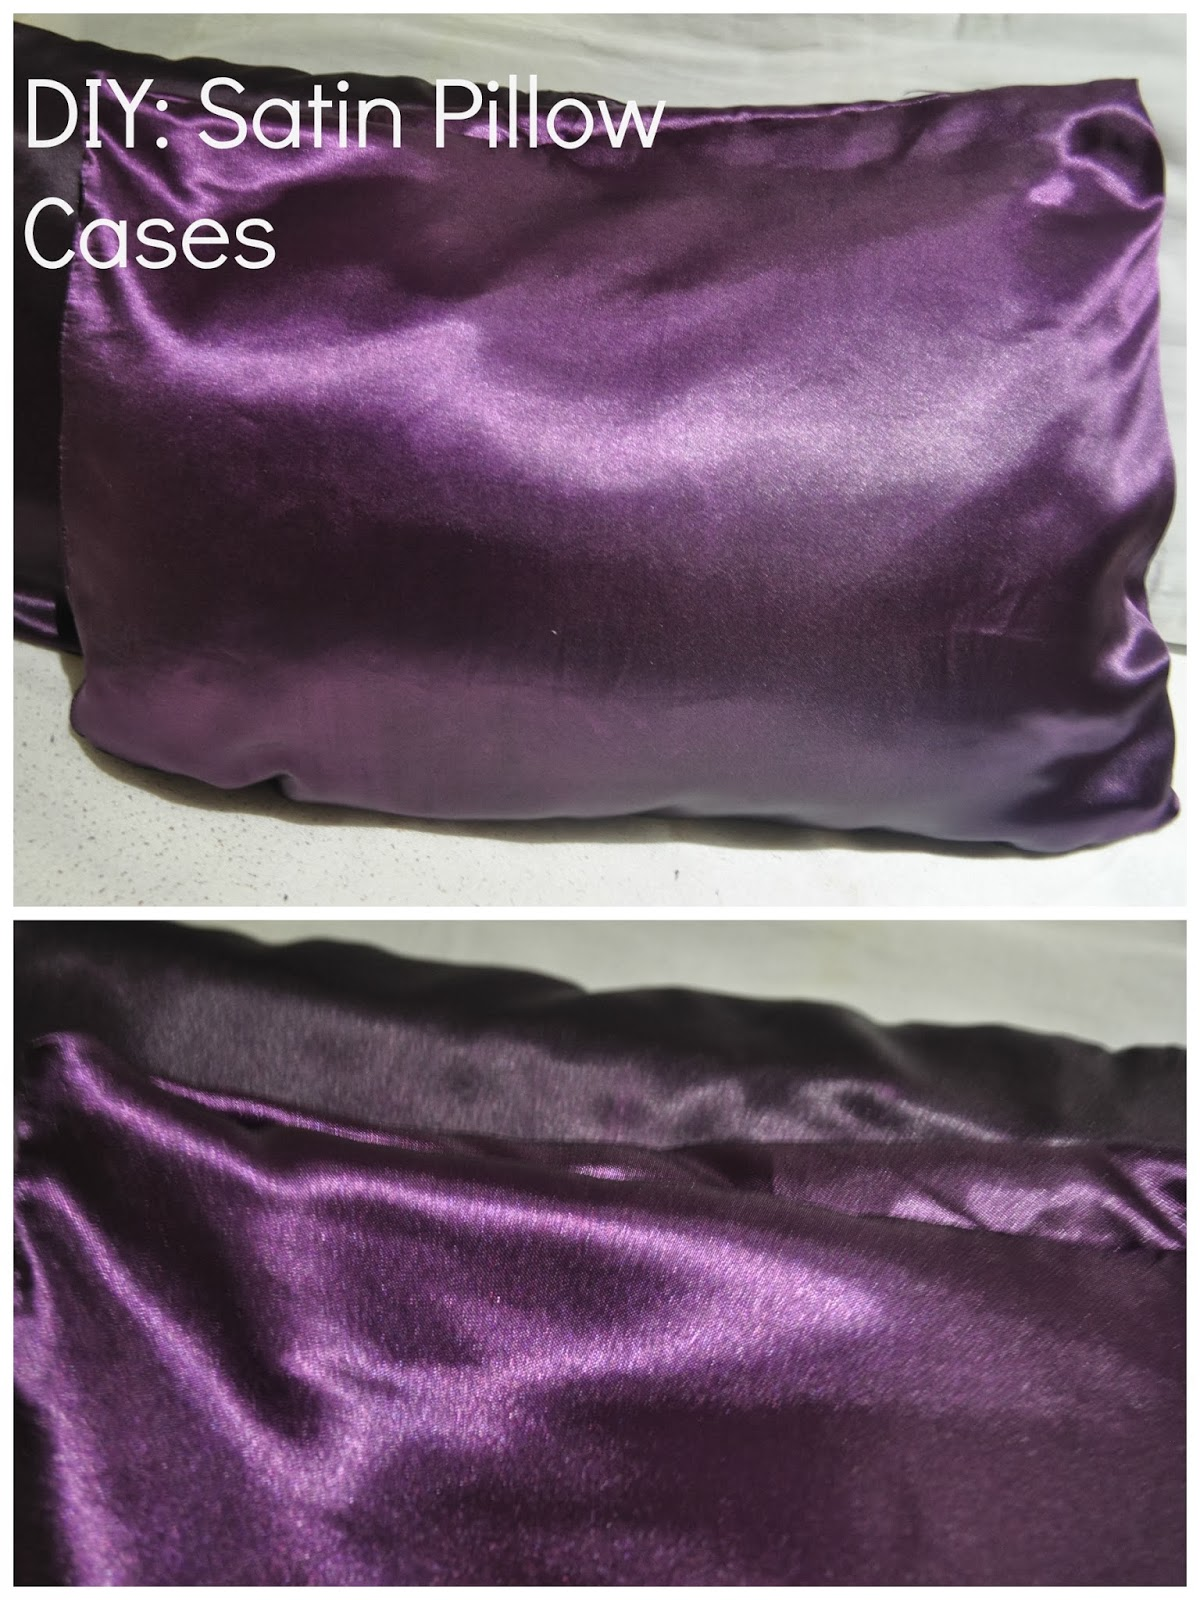 Diy Satin Pillowcase: Cherished Crowns  DIY  Satin Pillow Case,